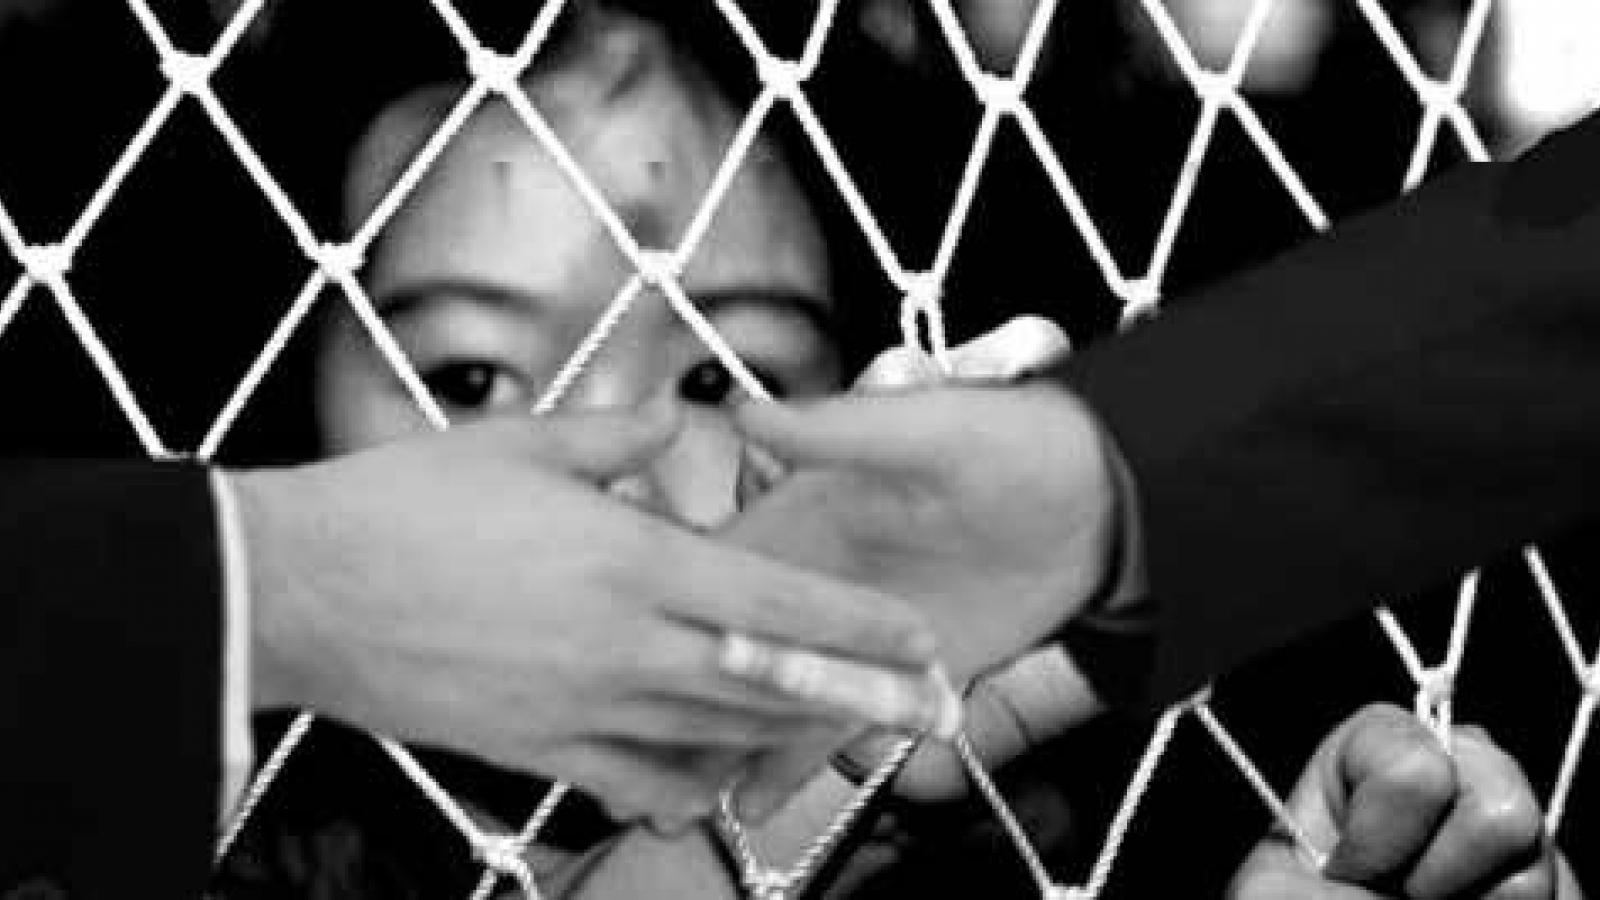 Campaign to raise awareness on tackling human trafficking